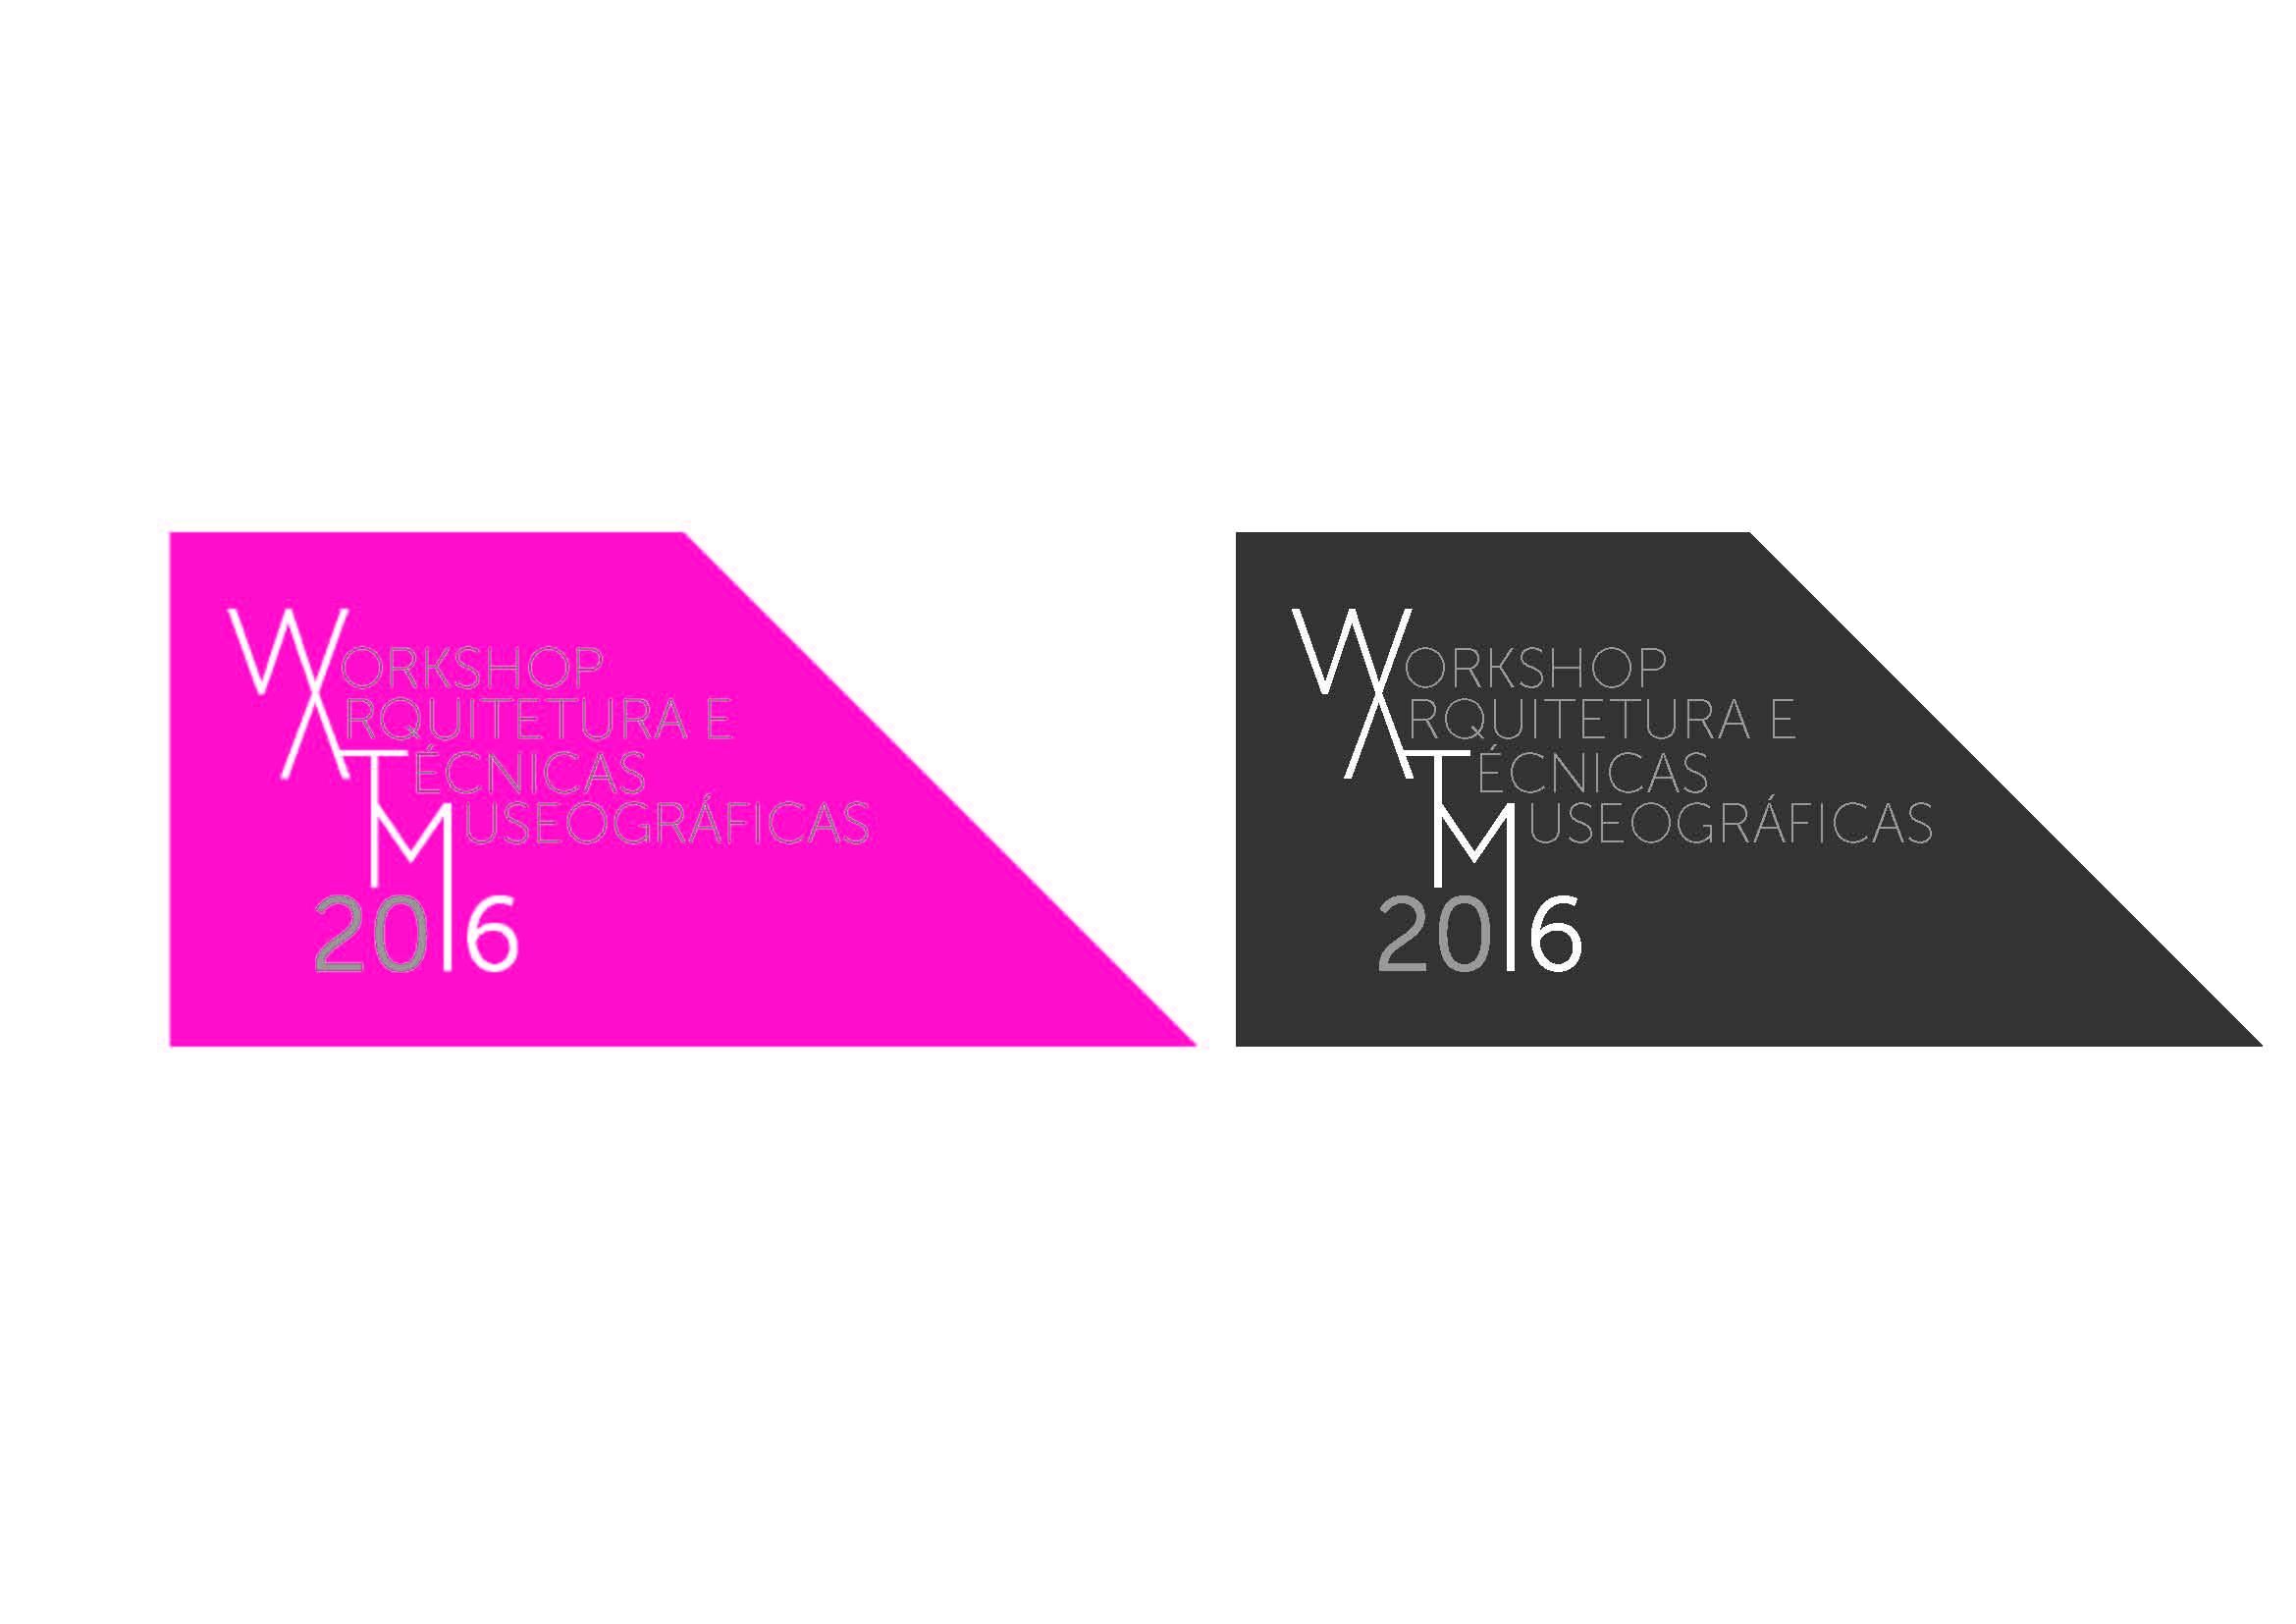 Workshop Internacional Arquitetura e Técnicas Museográficas 2016